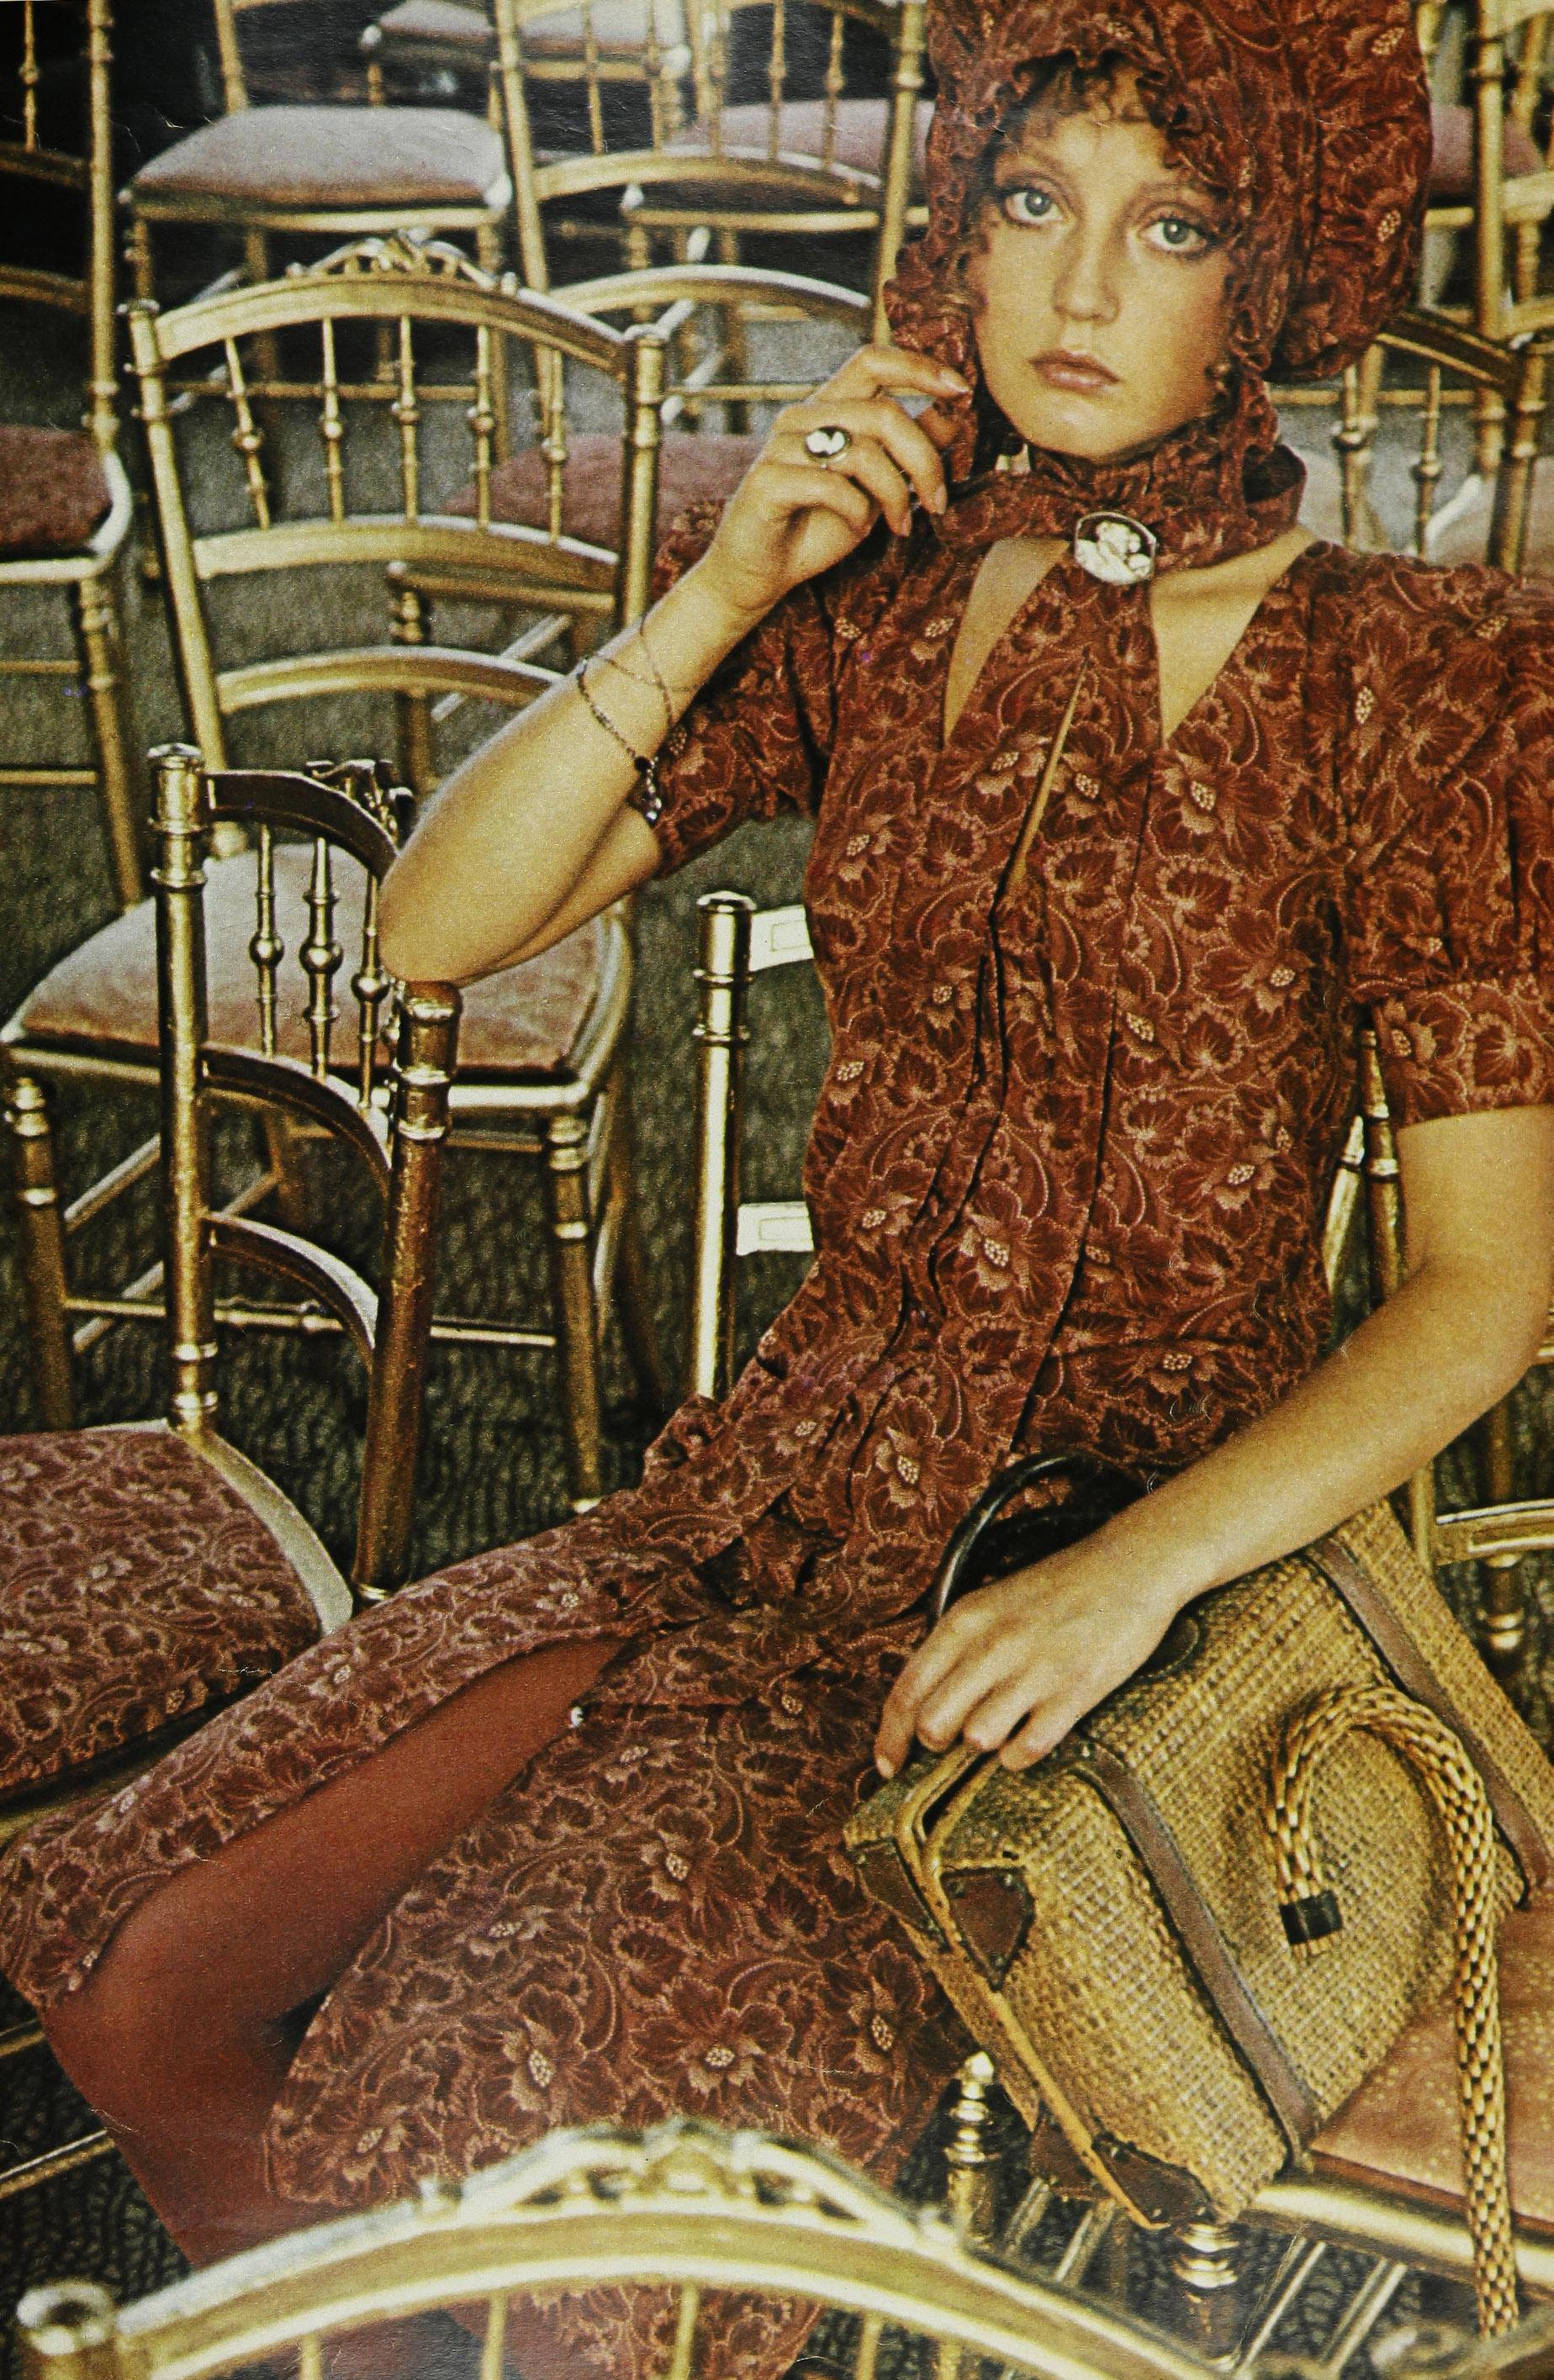 Modeling Biba for Seventeen, January 1971. Photo by Sarah Moon.